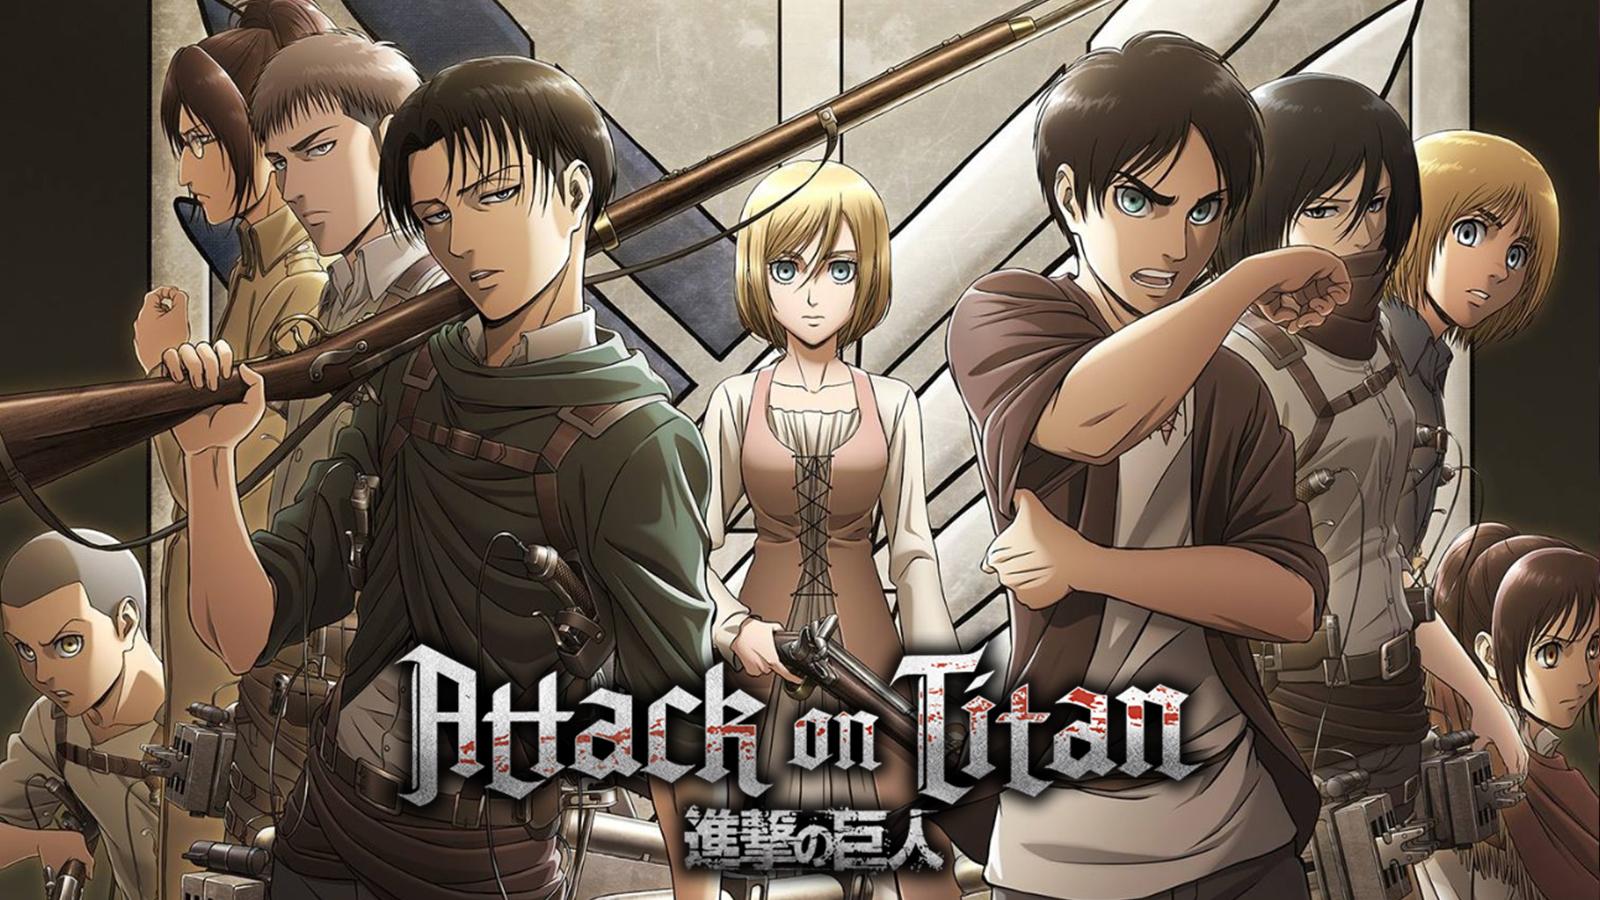 Attack on Titan season 4 trailer poster